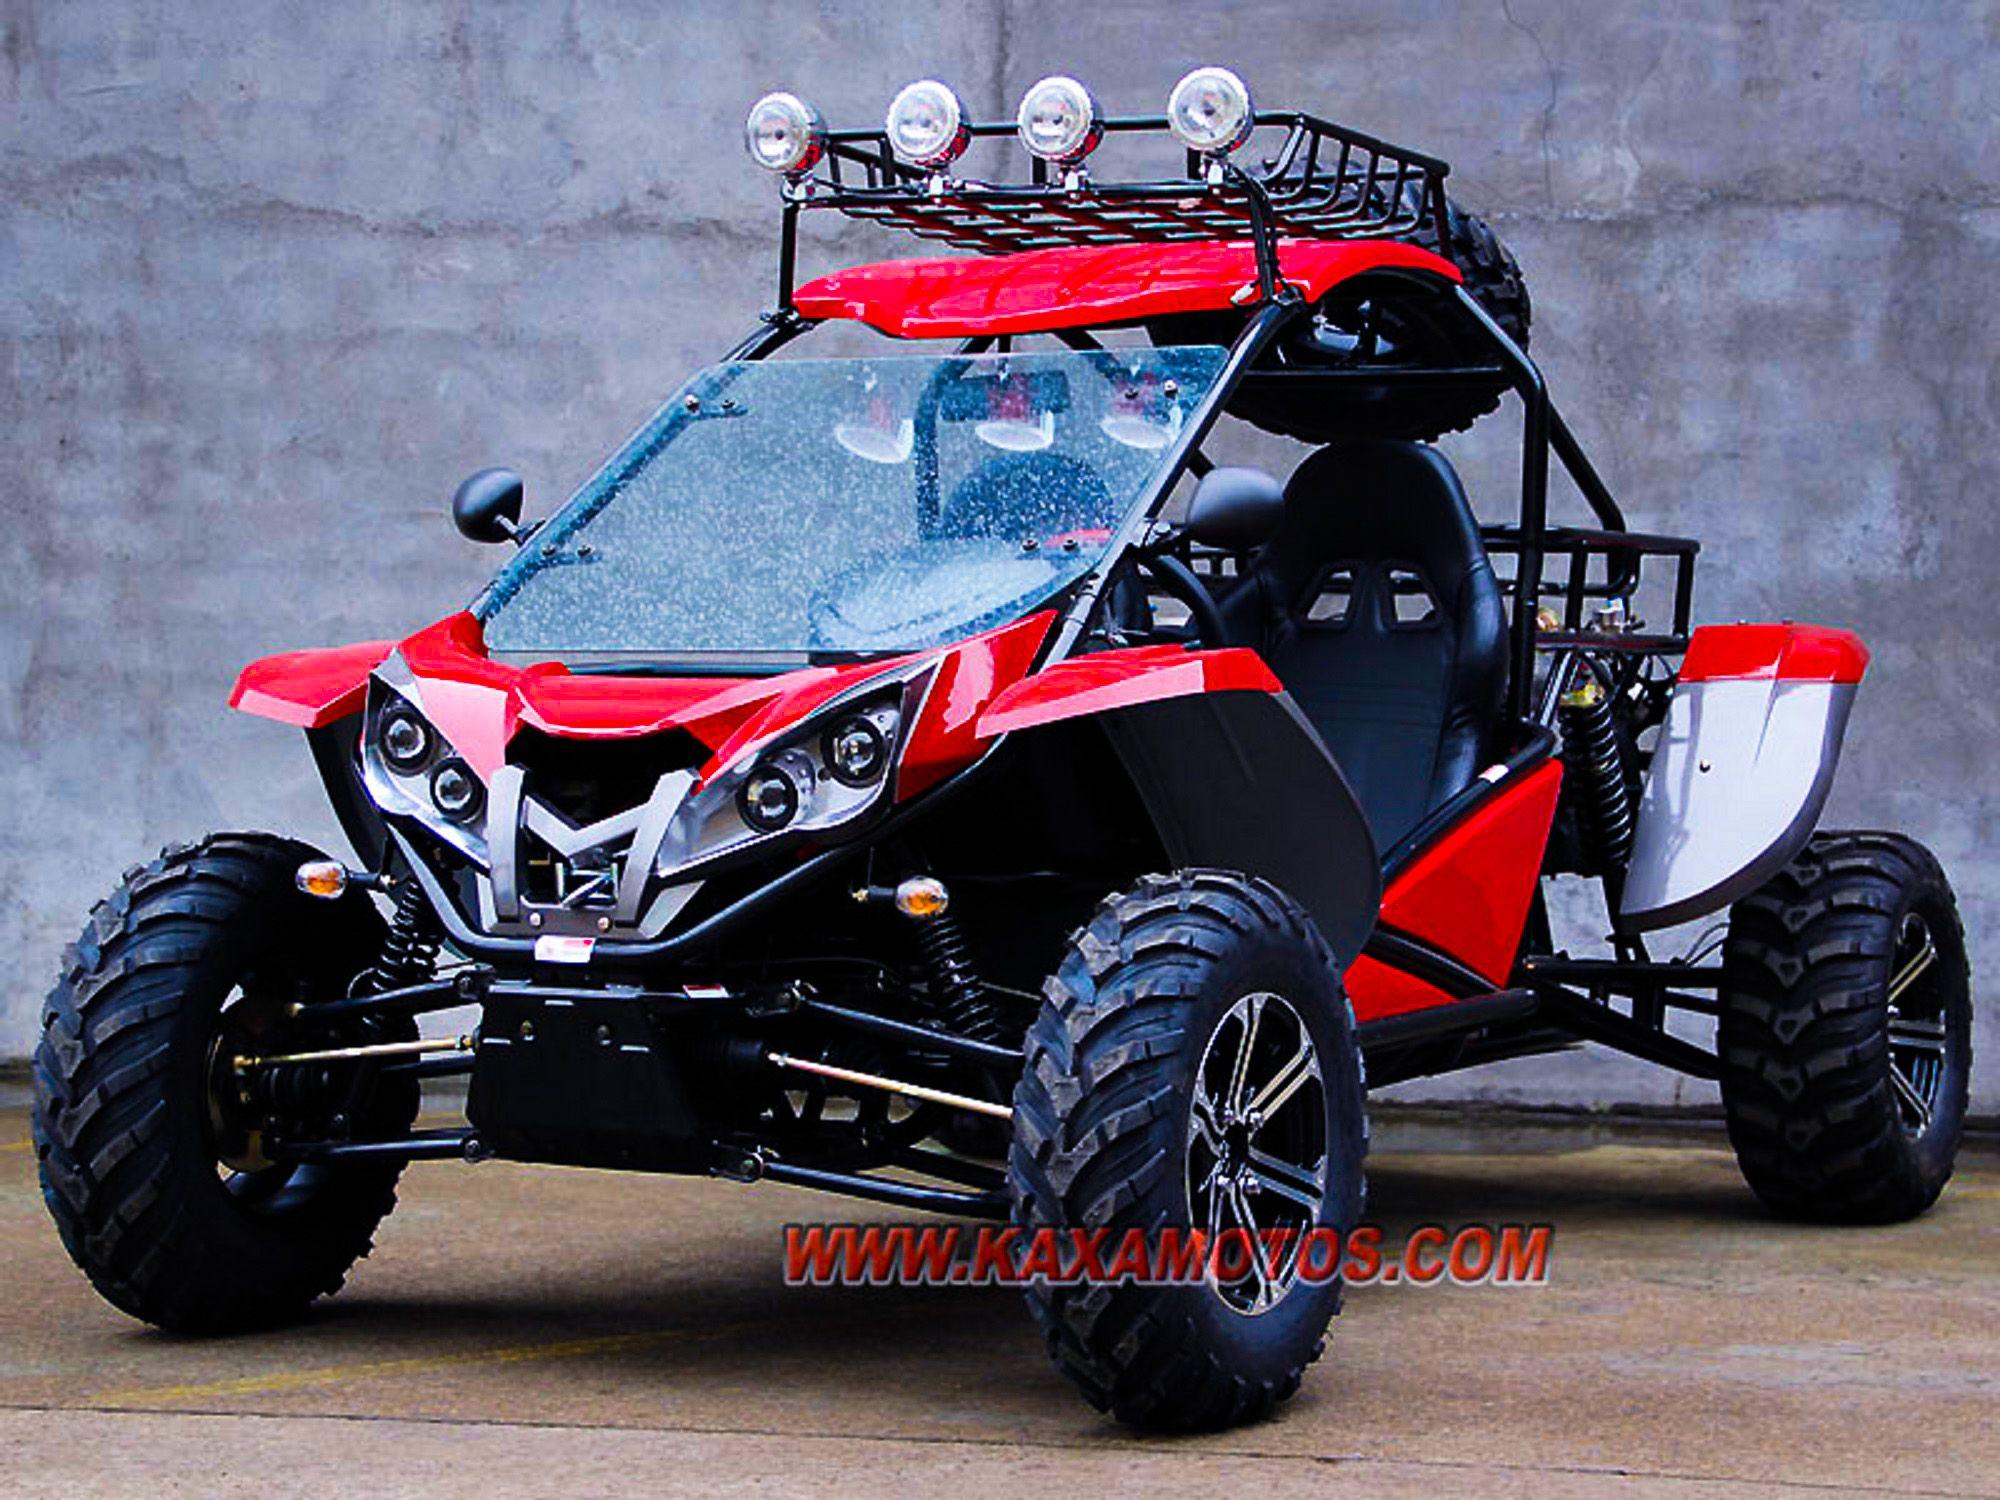 Kaxa motos 1100cc kxb 18 buggy http kaxamotos com